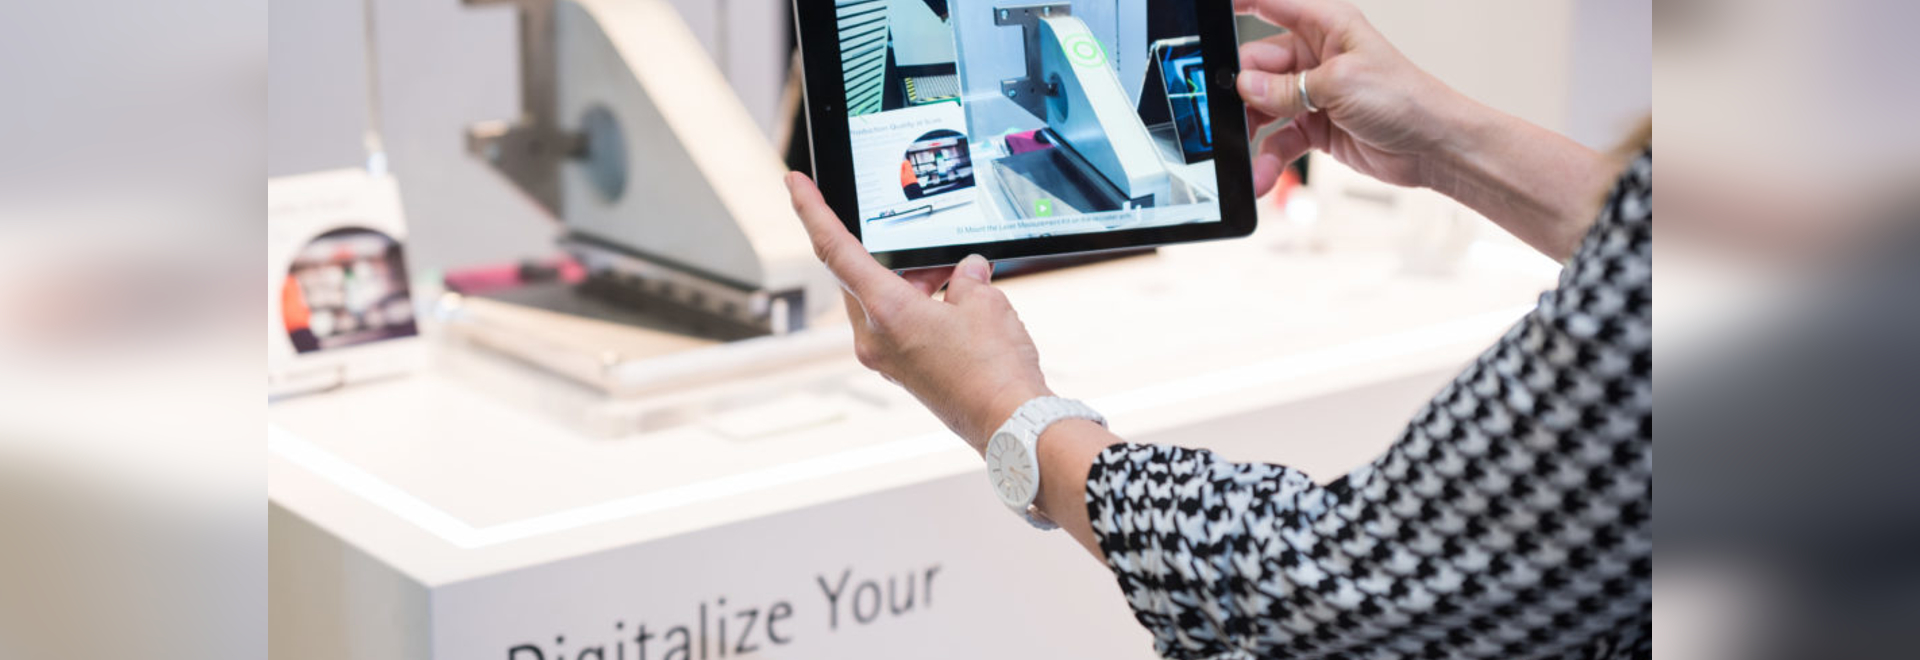 Formnext 2020 to take place virtually